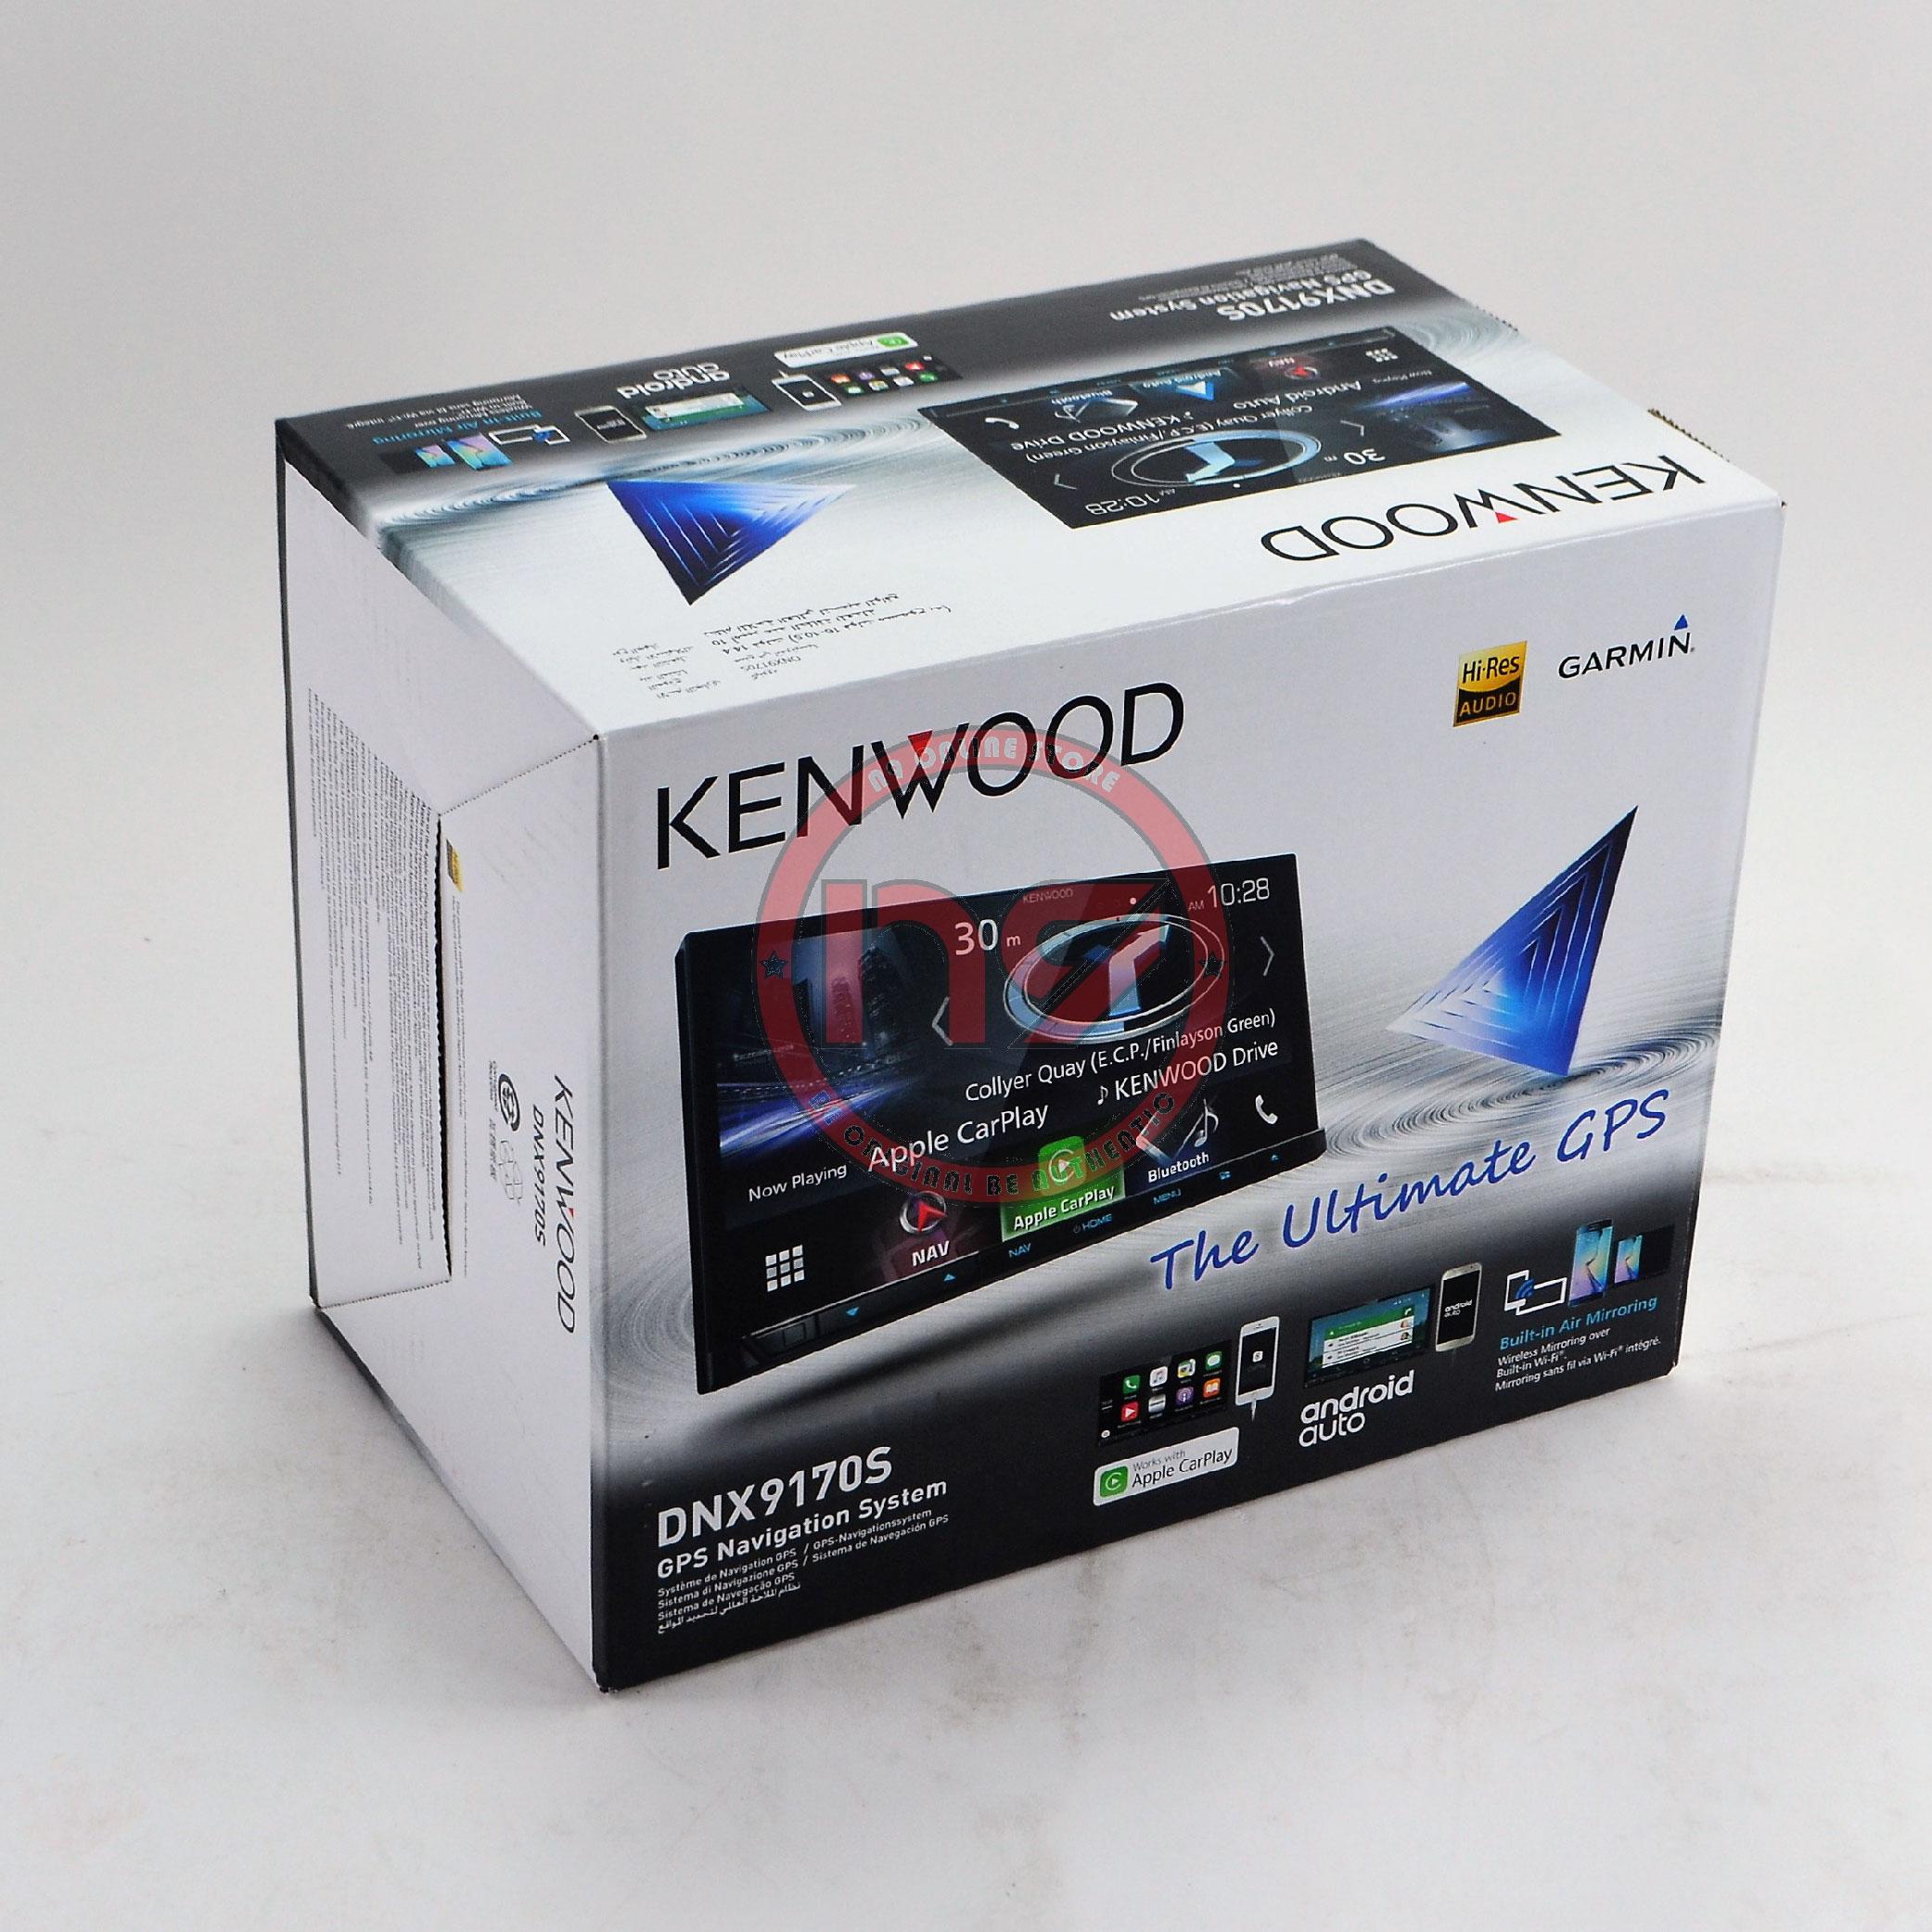 Kenwood DNX9170S 7' WiFi HDMI Apple CarPlay Android Auto Garmin Naviga